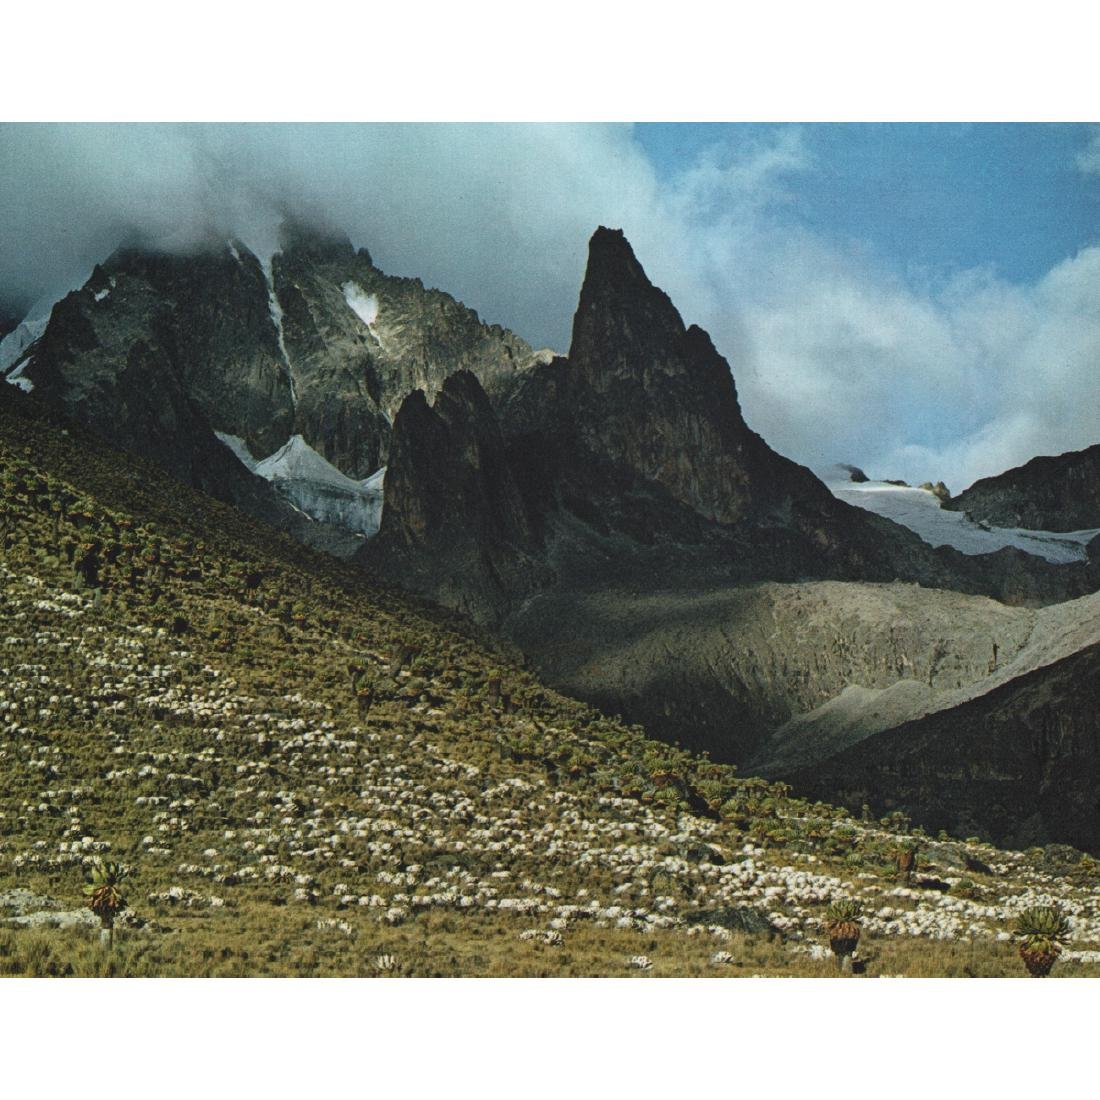 ELIOT PORTER - Mount Kenya, Africa